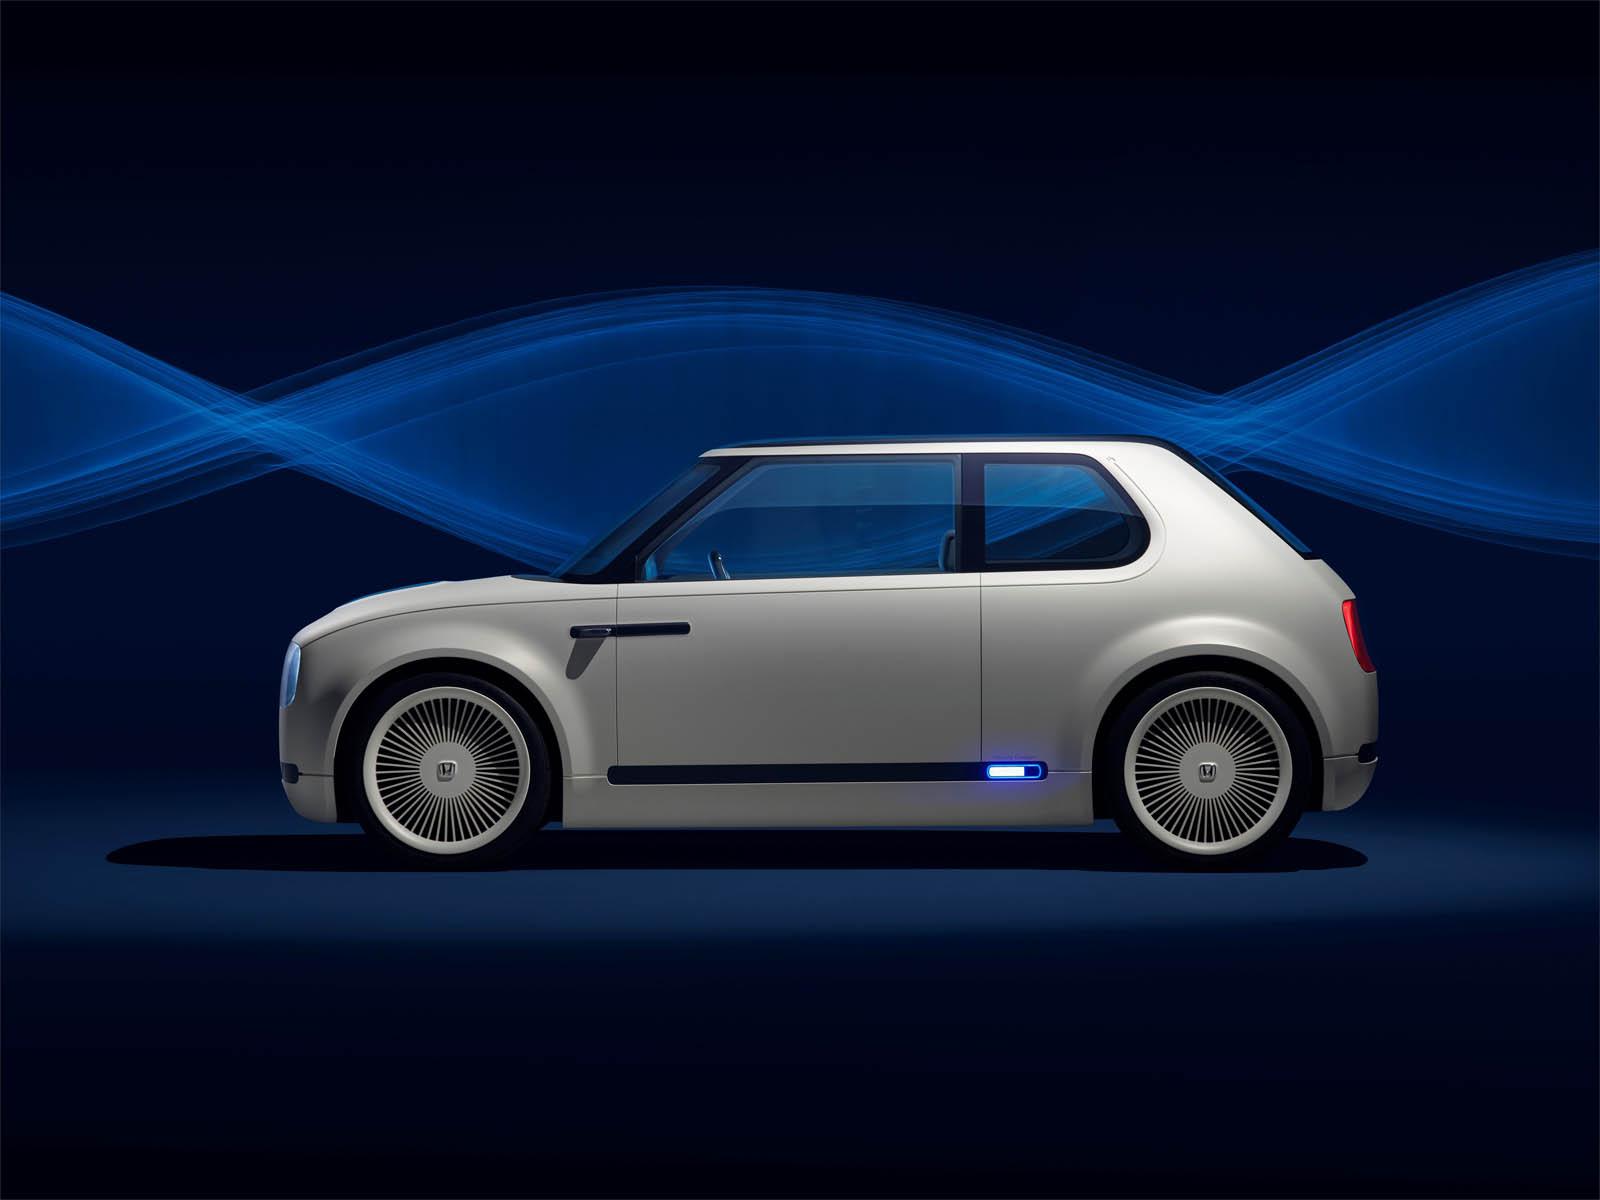 113872_Honda_Urban_EV_Concept_unveiled_at_the_Frankfurt_Motor_Show%2Bcopy.jpg